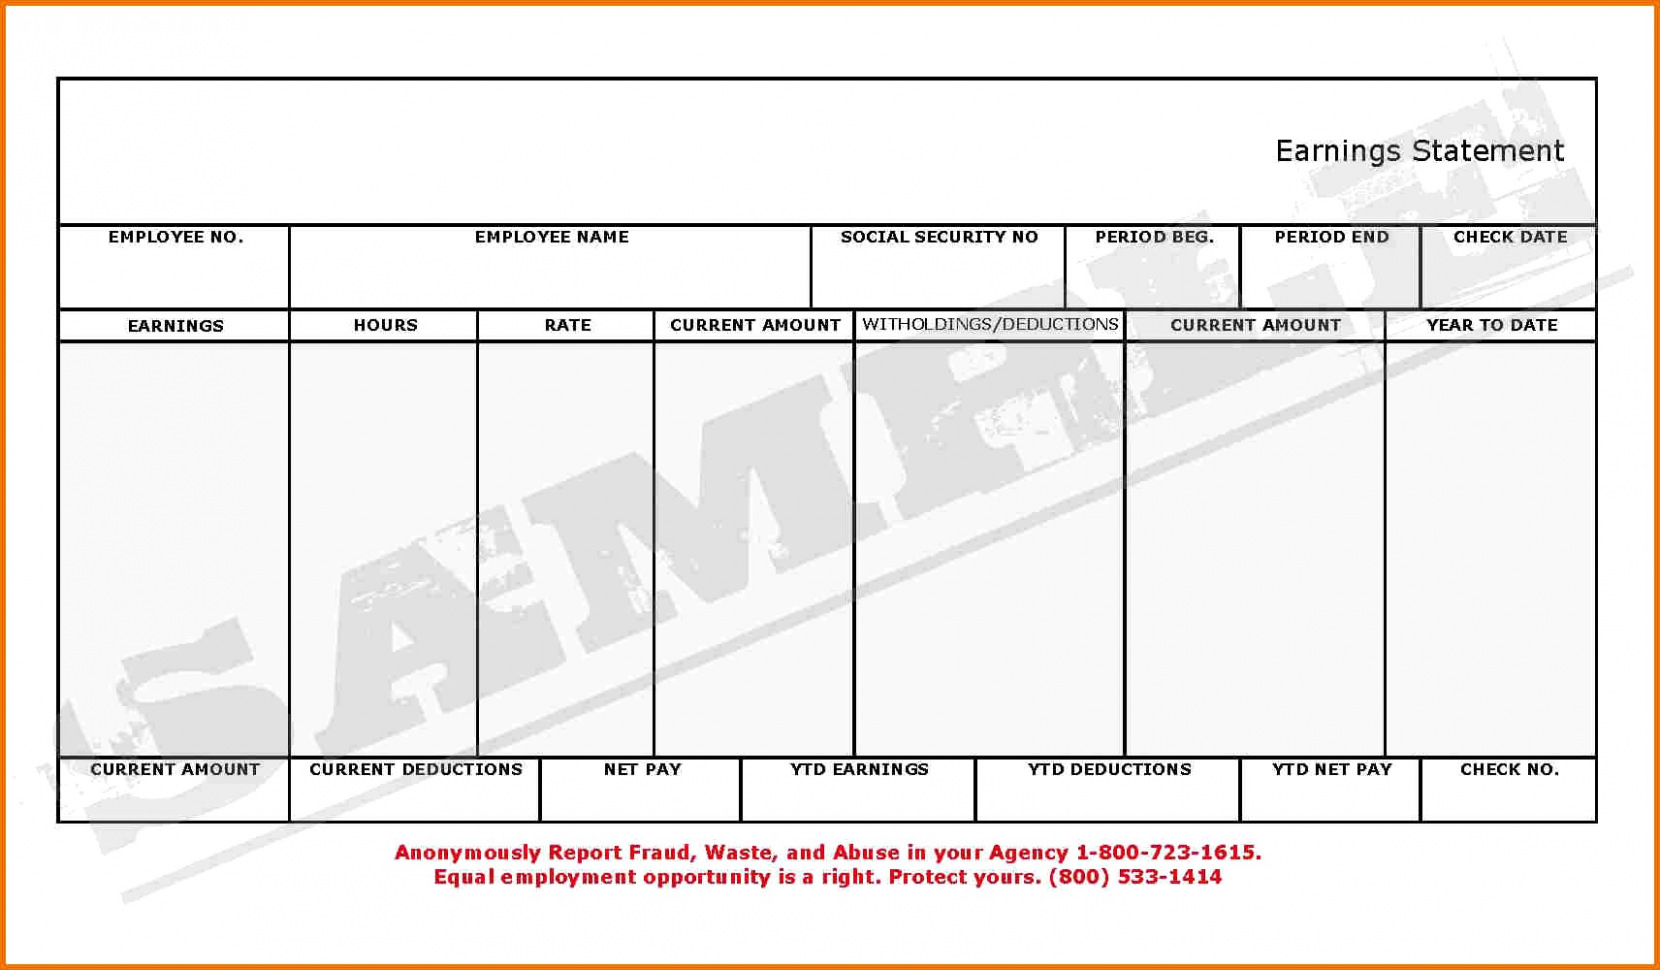 Blank Payroll Checks Download Free Pay Stubs Template Example - Free Printable Blank Check Stubs